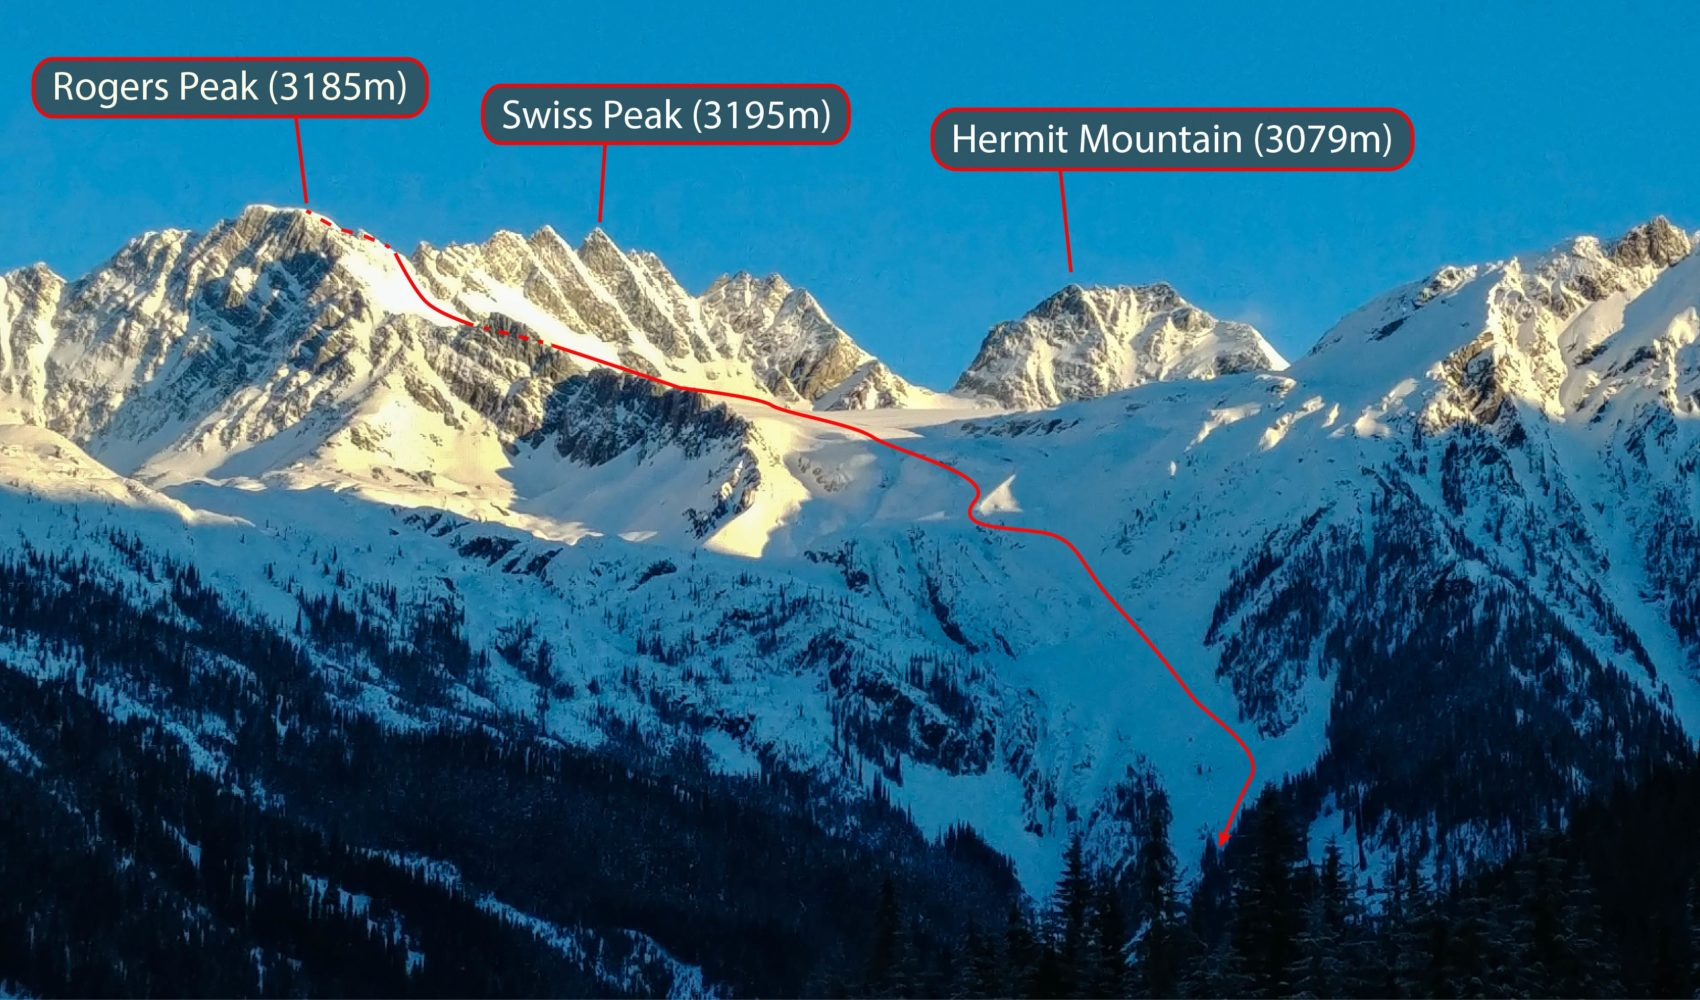 mt rogers, swiss peak, hermit mountain